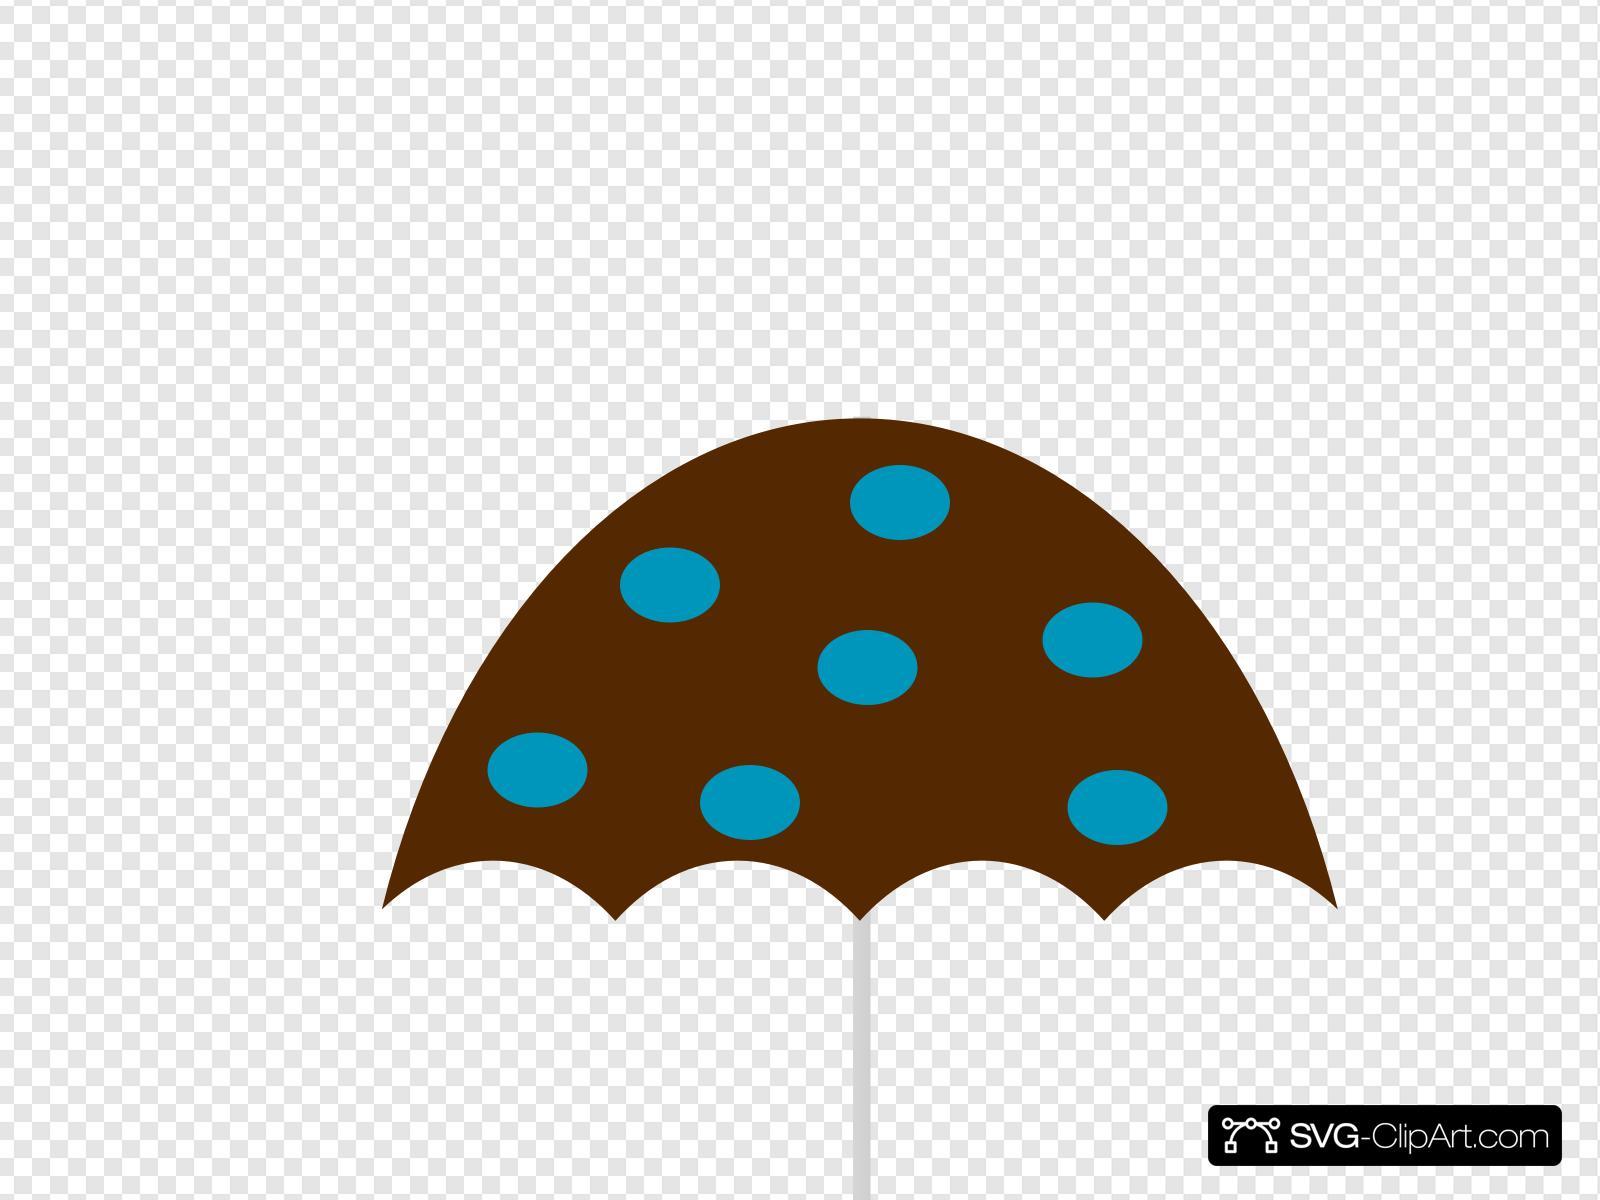 Polka Dot Umbrella Clip art, Icon and SVG.